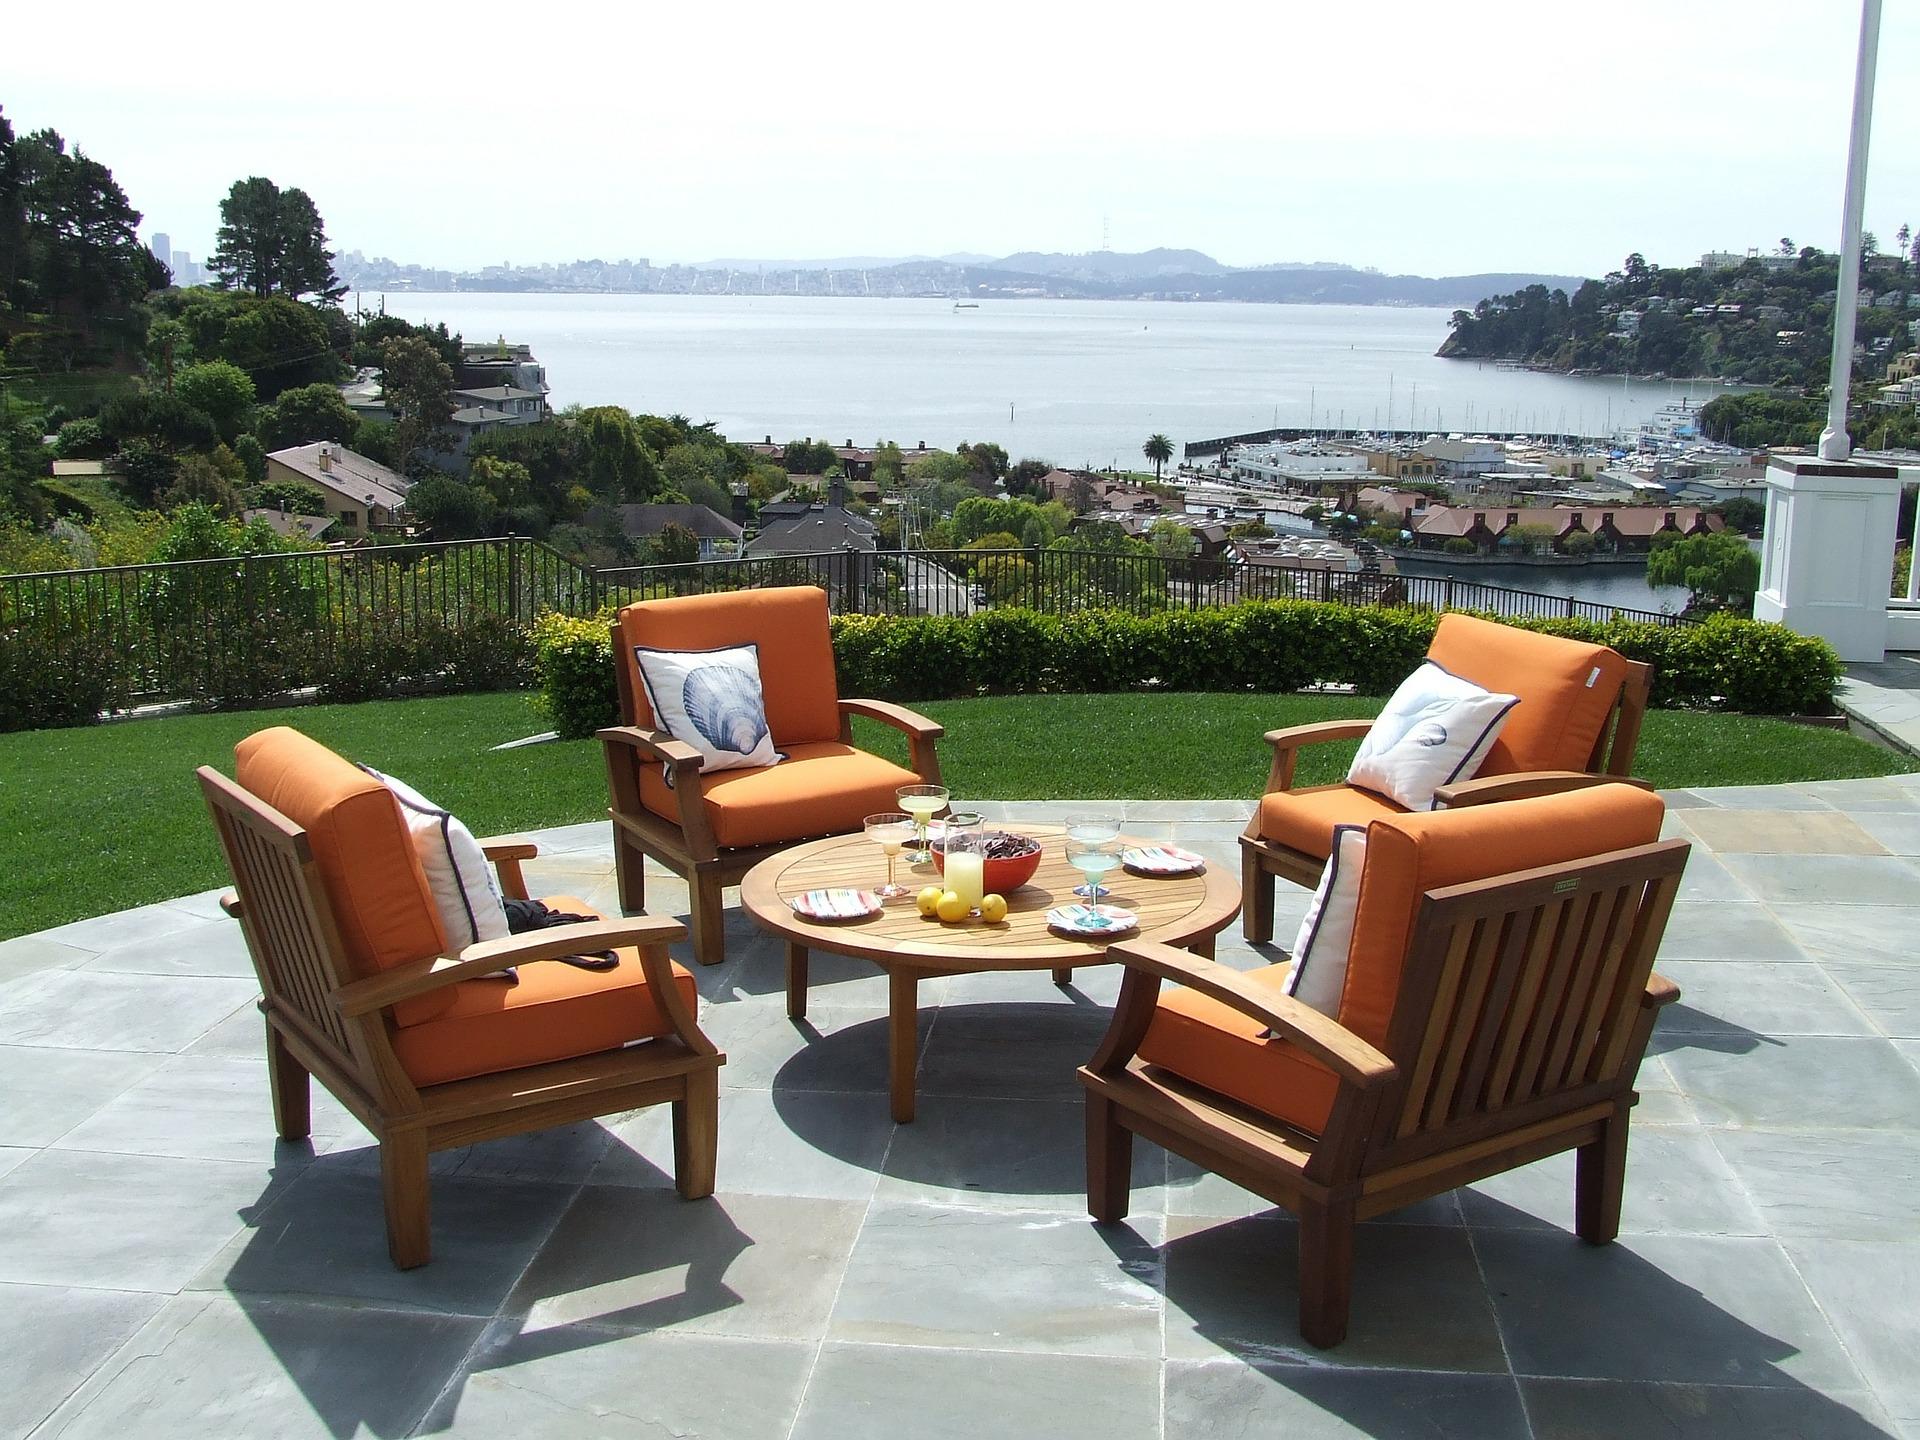 Patio Furniture Design Home Design Ideas and